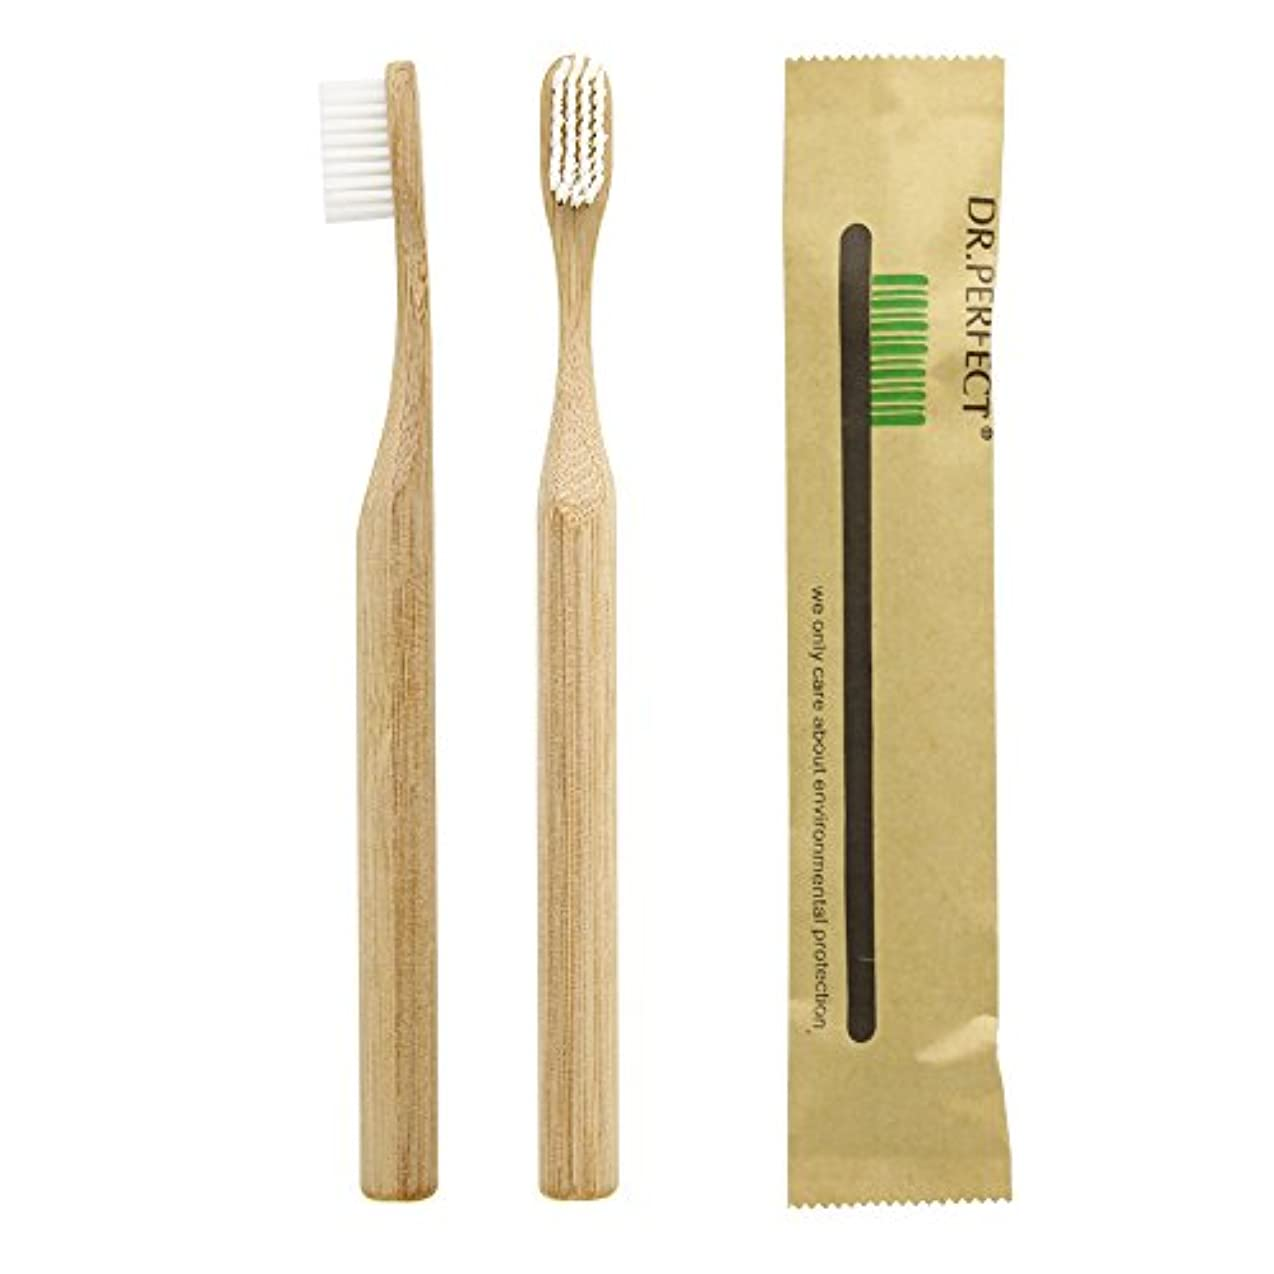 Dr.Perfect Bamboo Toothbrush アダルト竹の歯ブラシ ナイロン毛 環境にやさしい製品 (ホワイト)